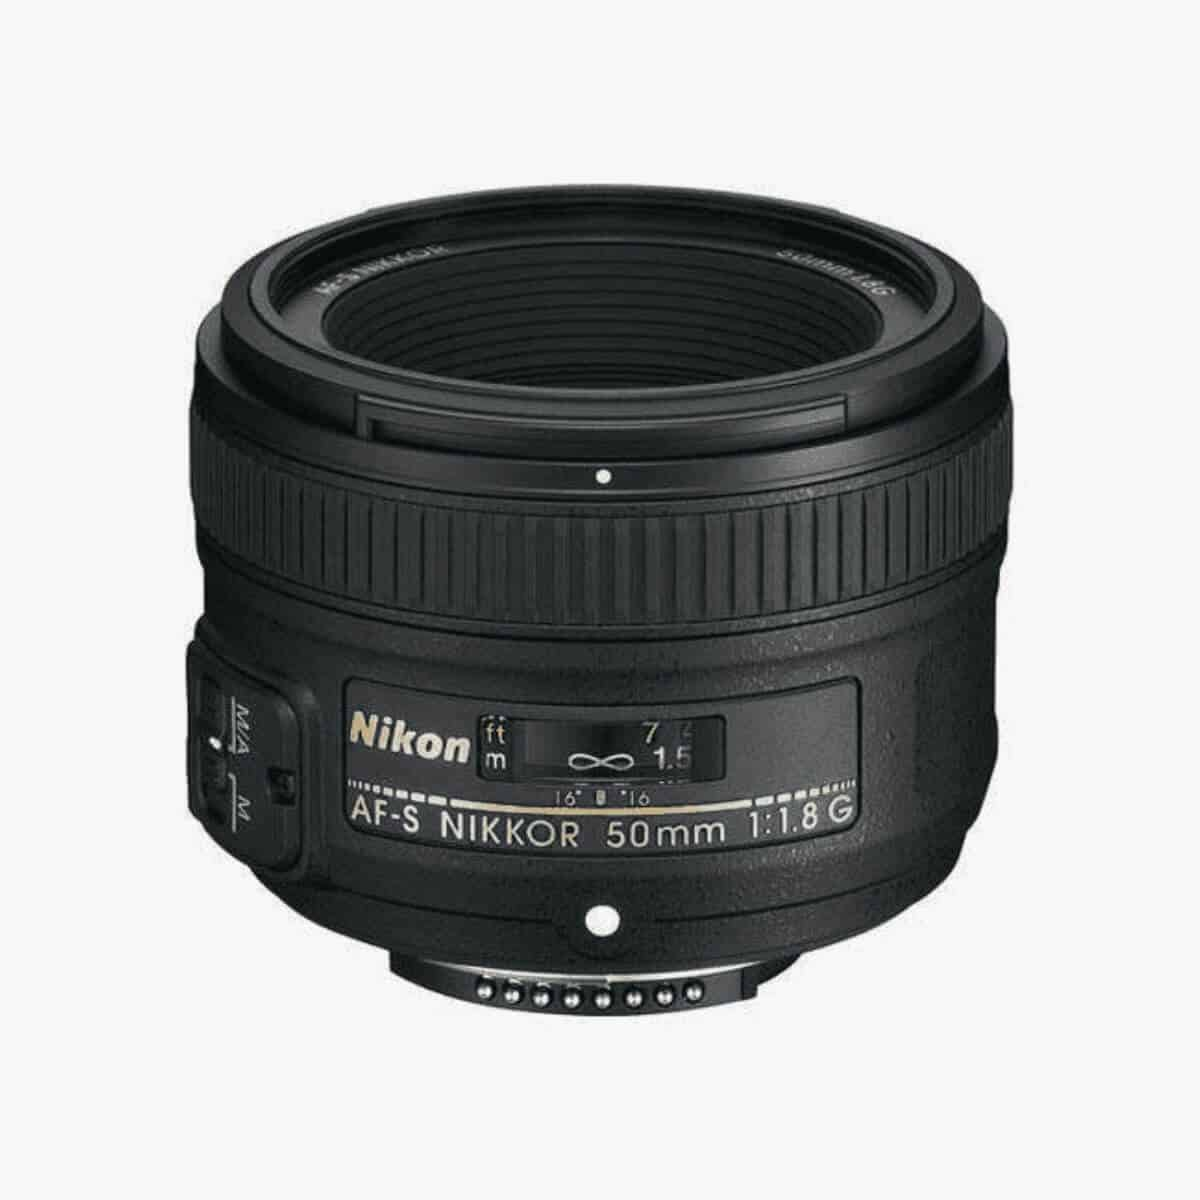 Nikon 50mm lens.